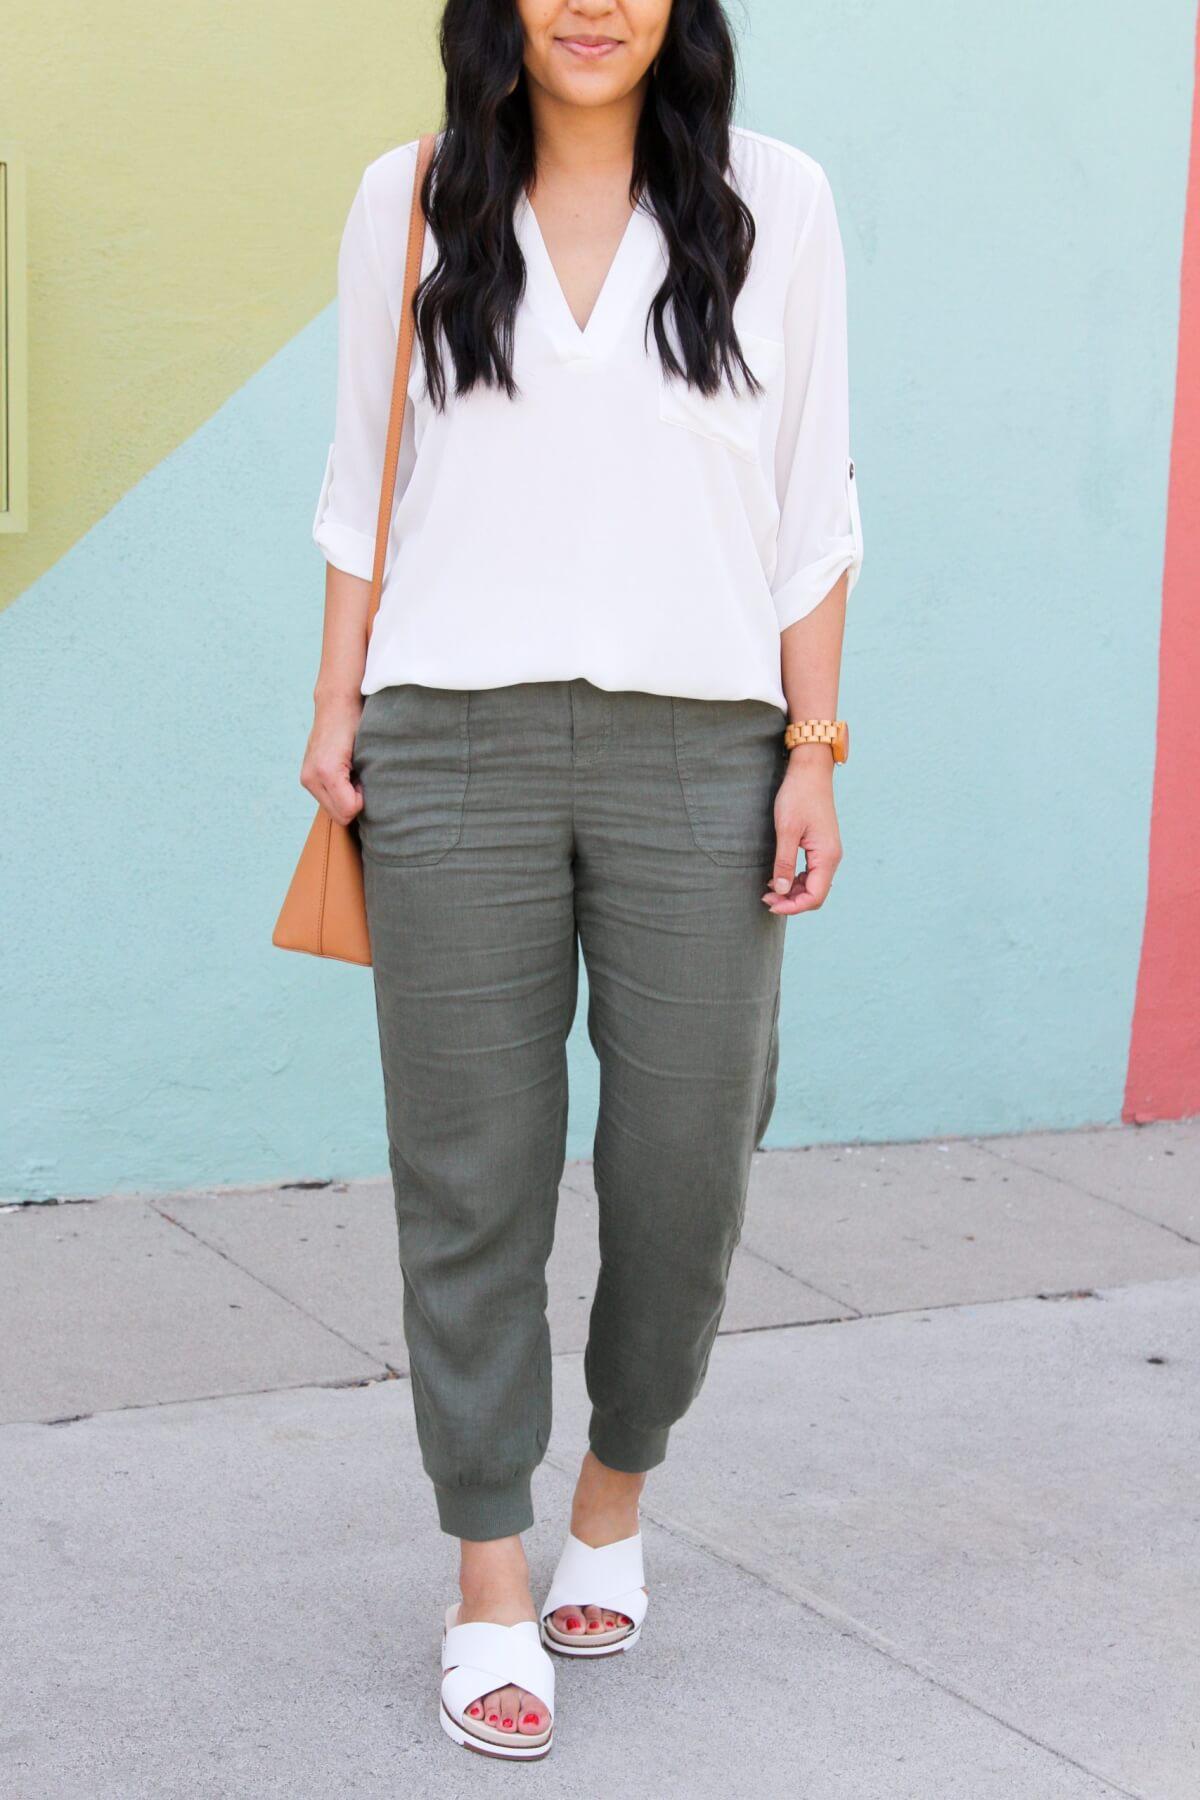 Summer Linen Pants Outfit:  white v-neck tunic + olive linen joggers + tan crossbody bag + white slide sandals + tan leather earrings